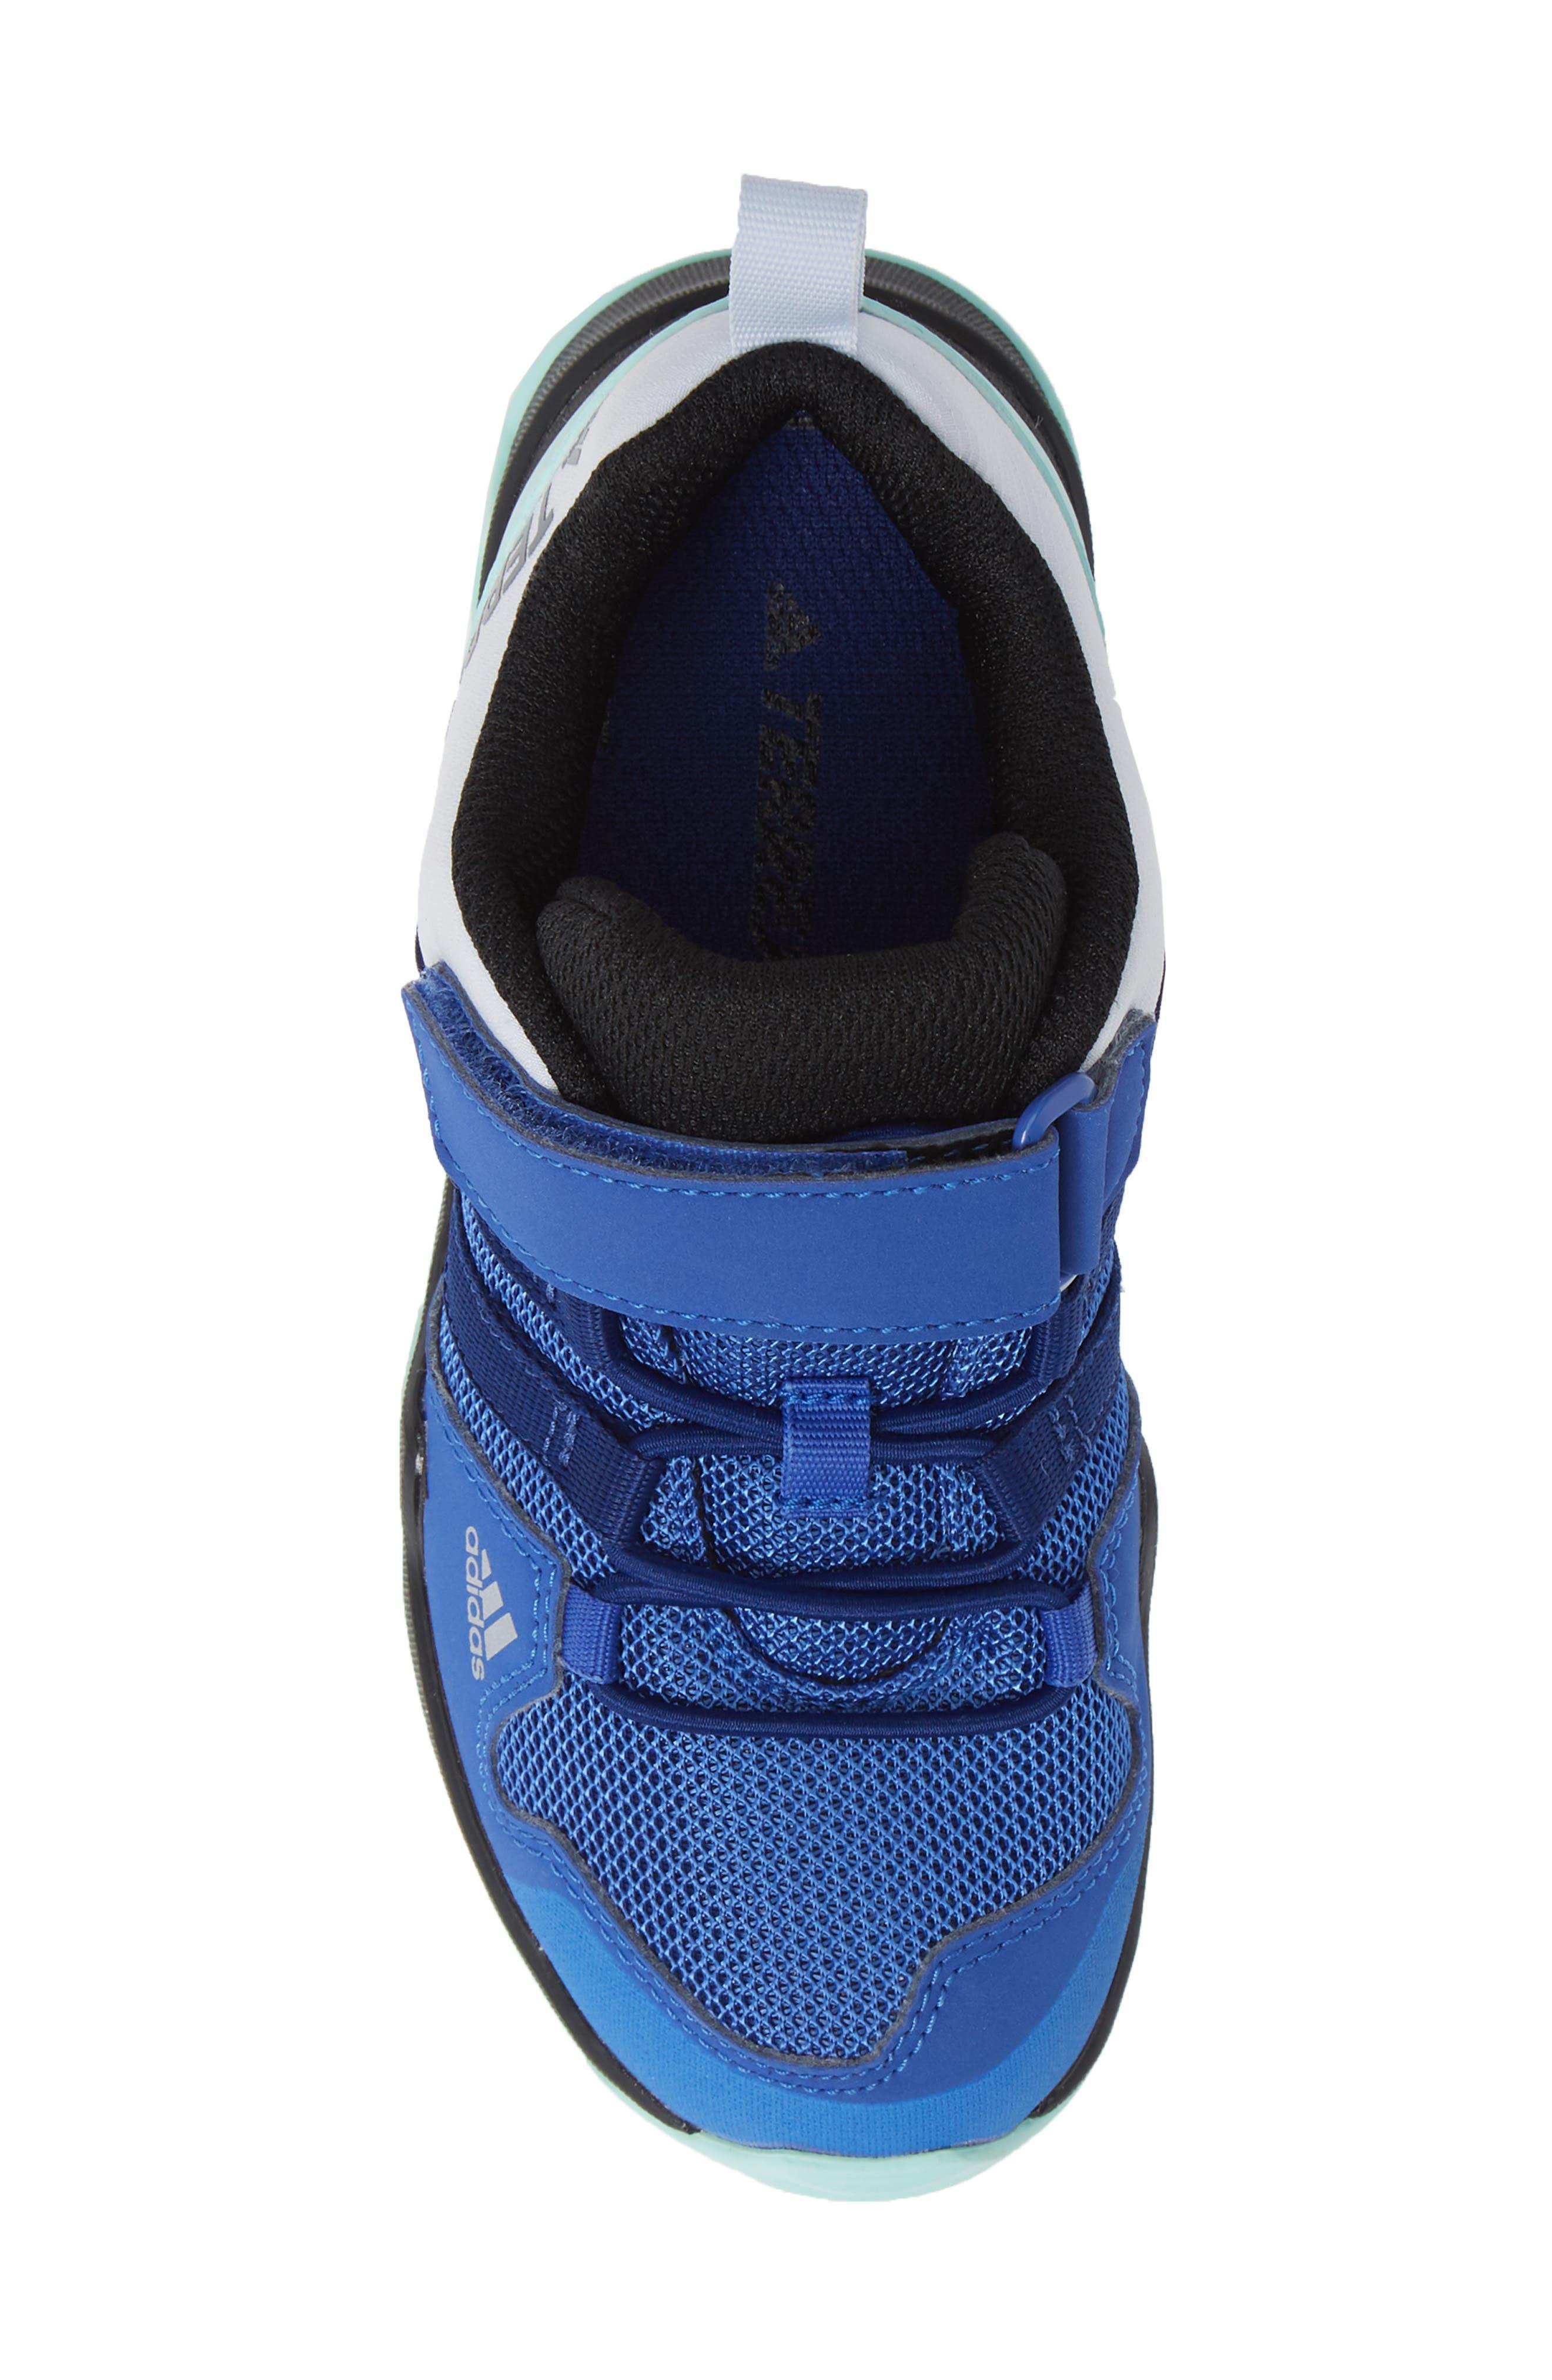 Terrex AX2R Sneaker,                             Alternate thumbnail 5, color,                             HI-RES BLUE/ MYSTERY INK/ MINT